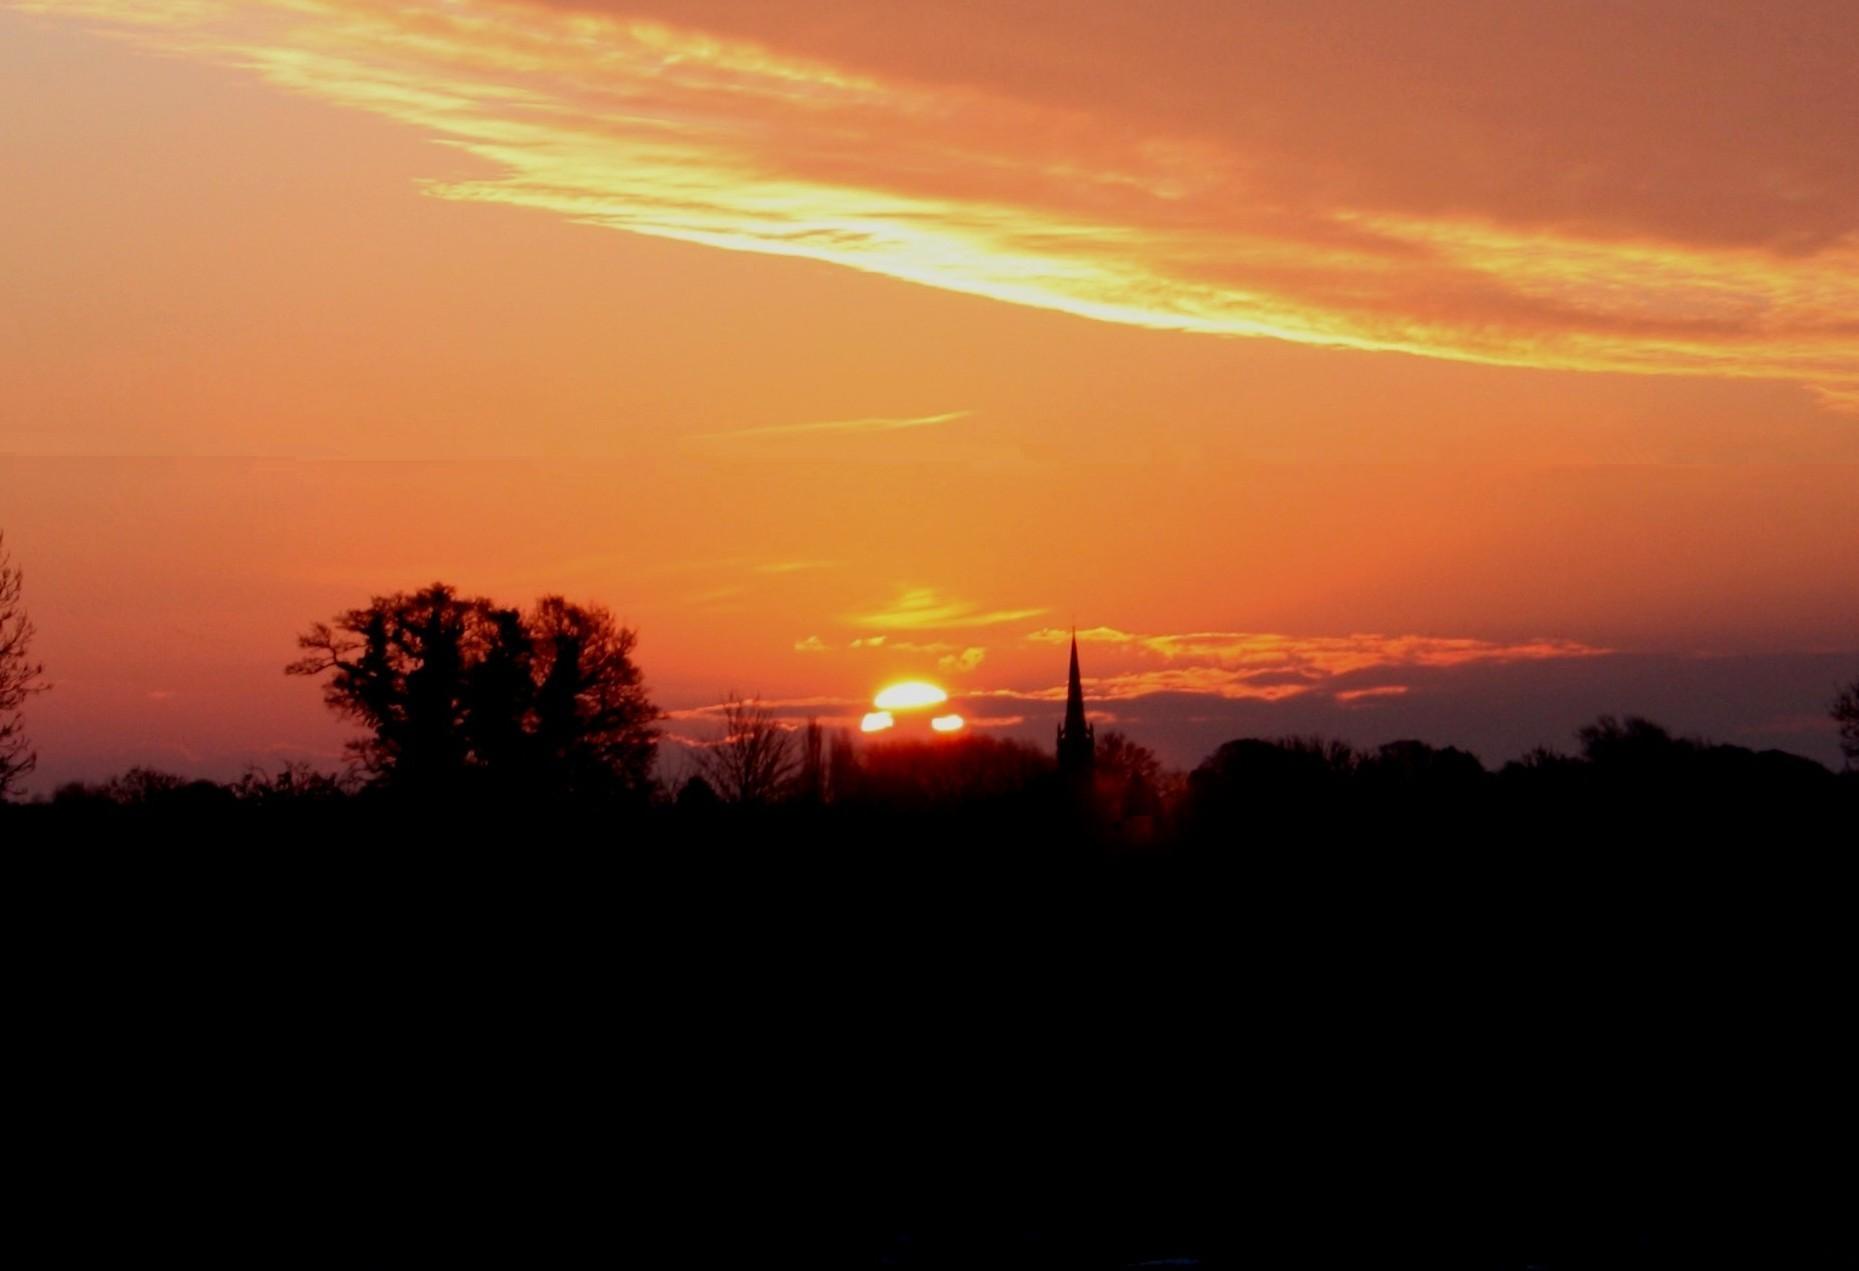 Sunrise over Newton on Ouse